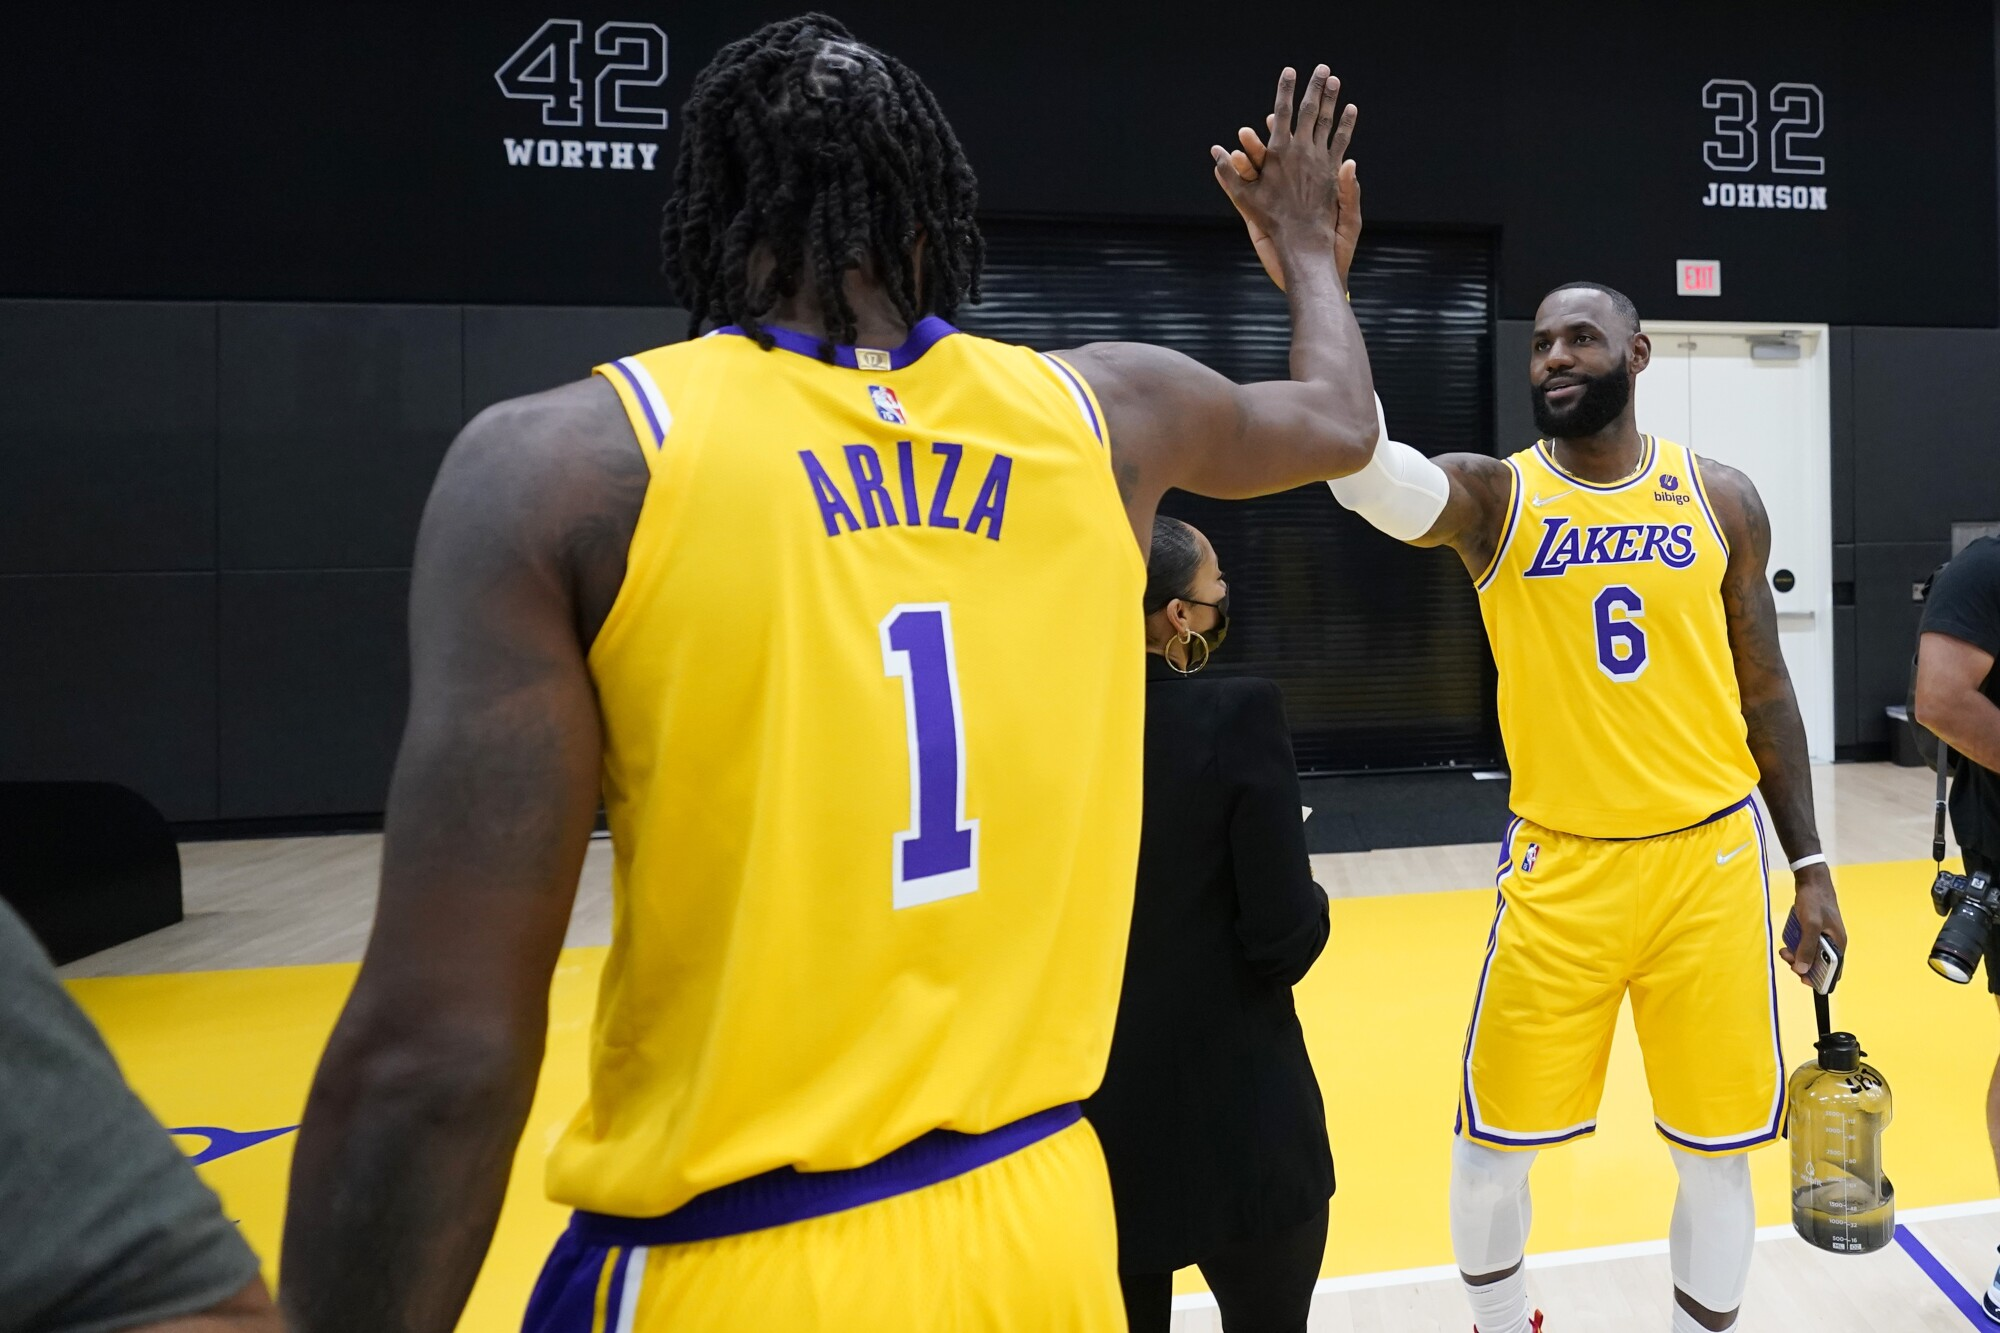 Los Angeles Lakers forward LeBron James, right, high-fives teammate Trevor Ariza.